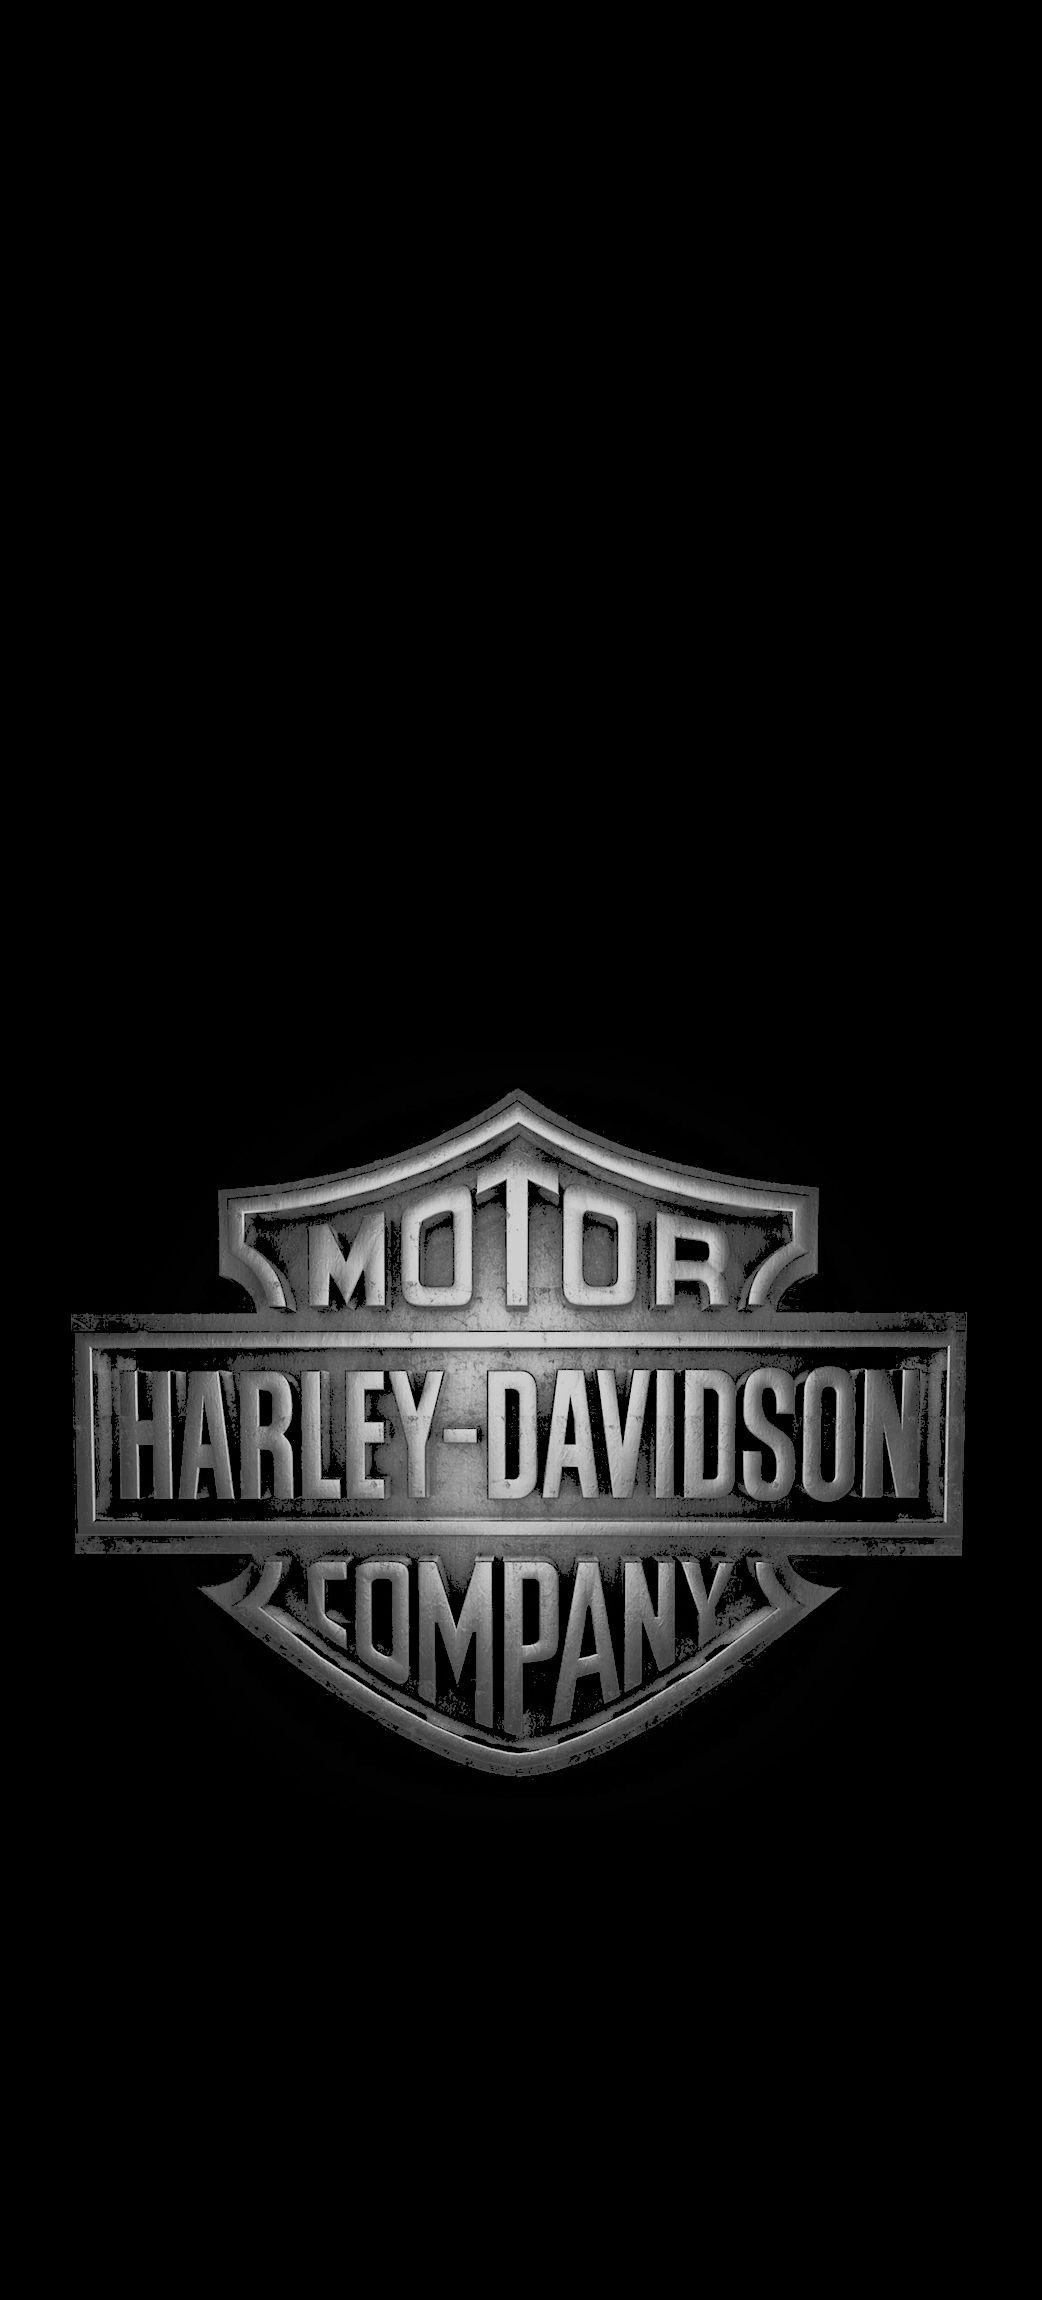 Harley Phone Wallpapers Harley Davidson Wallpaper Harley Davidson Decals Harley